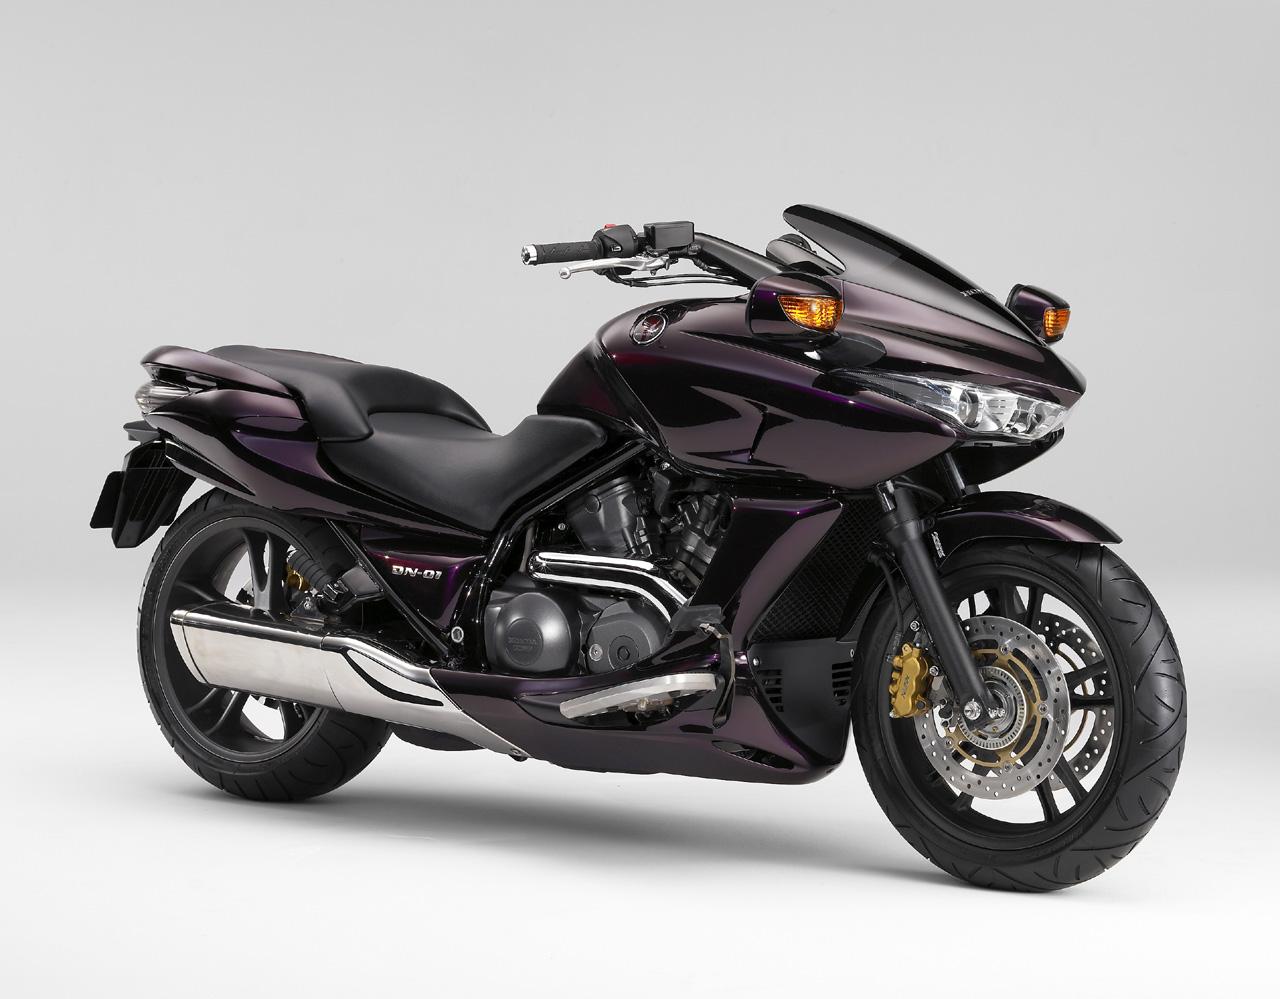 2011 Motorcycles: 2011 Honda Dn-01 Wallpapers